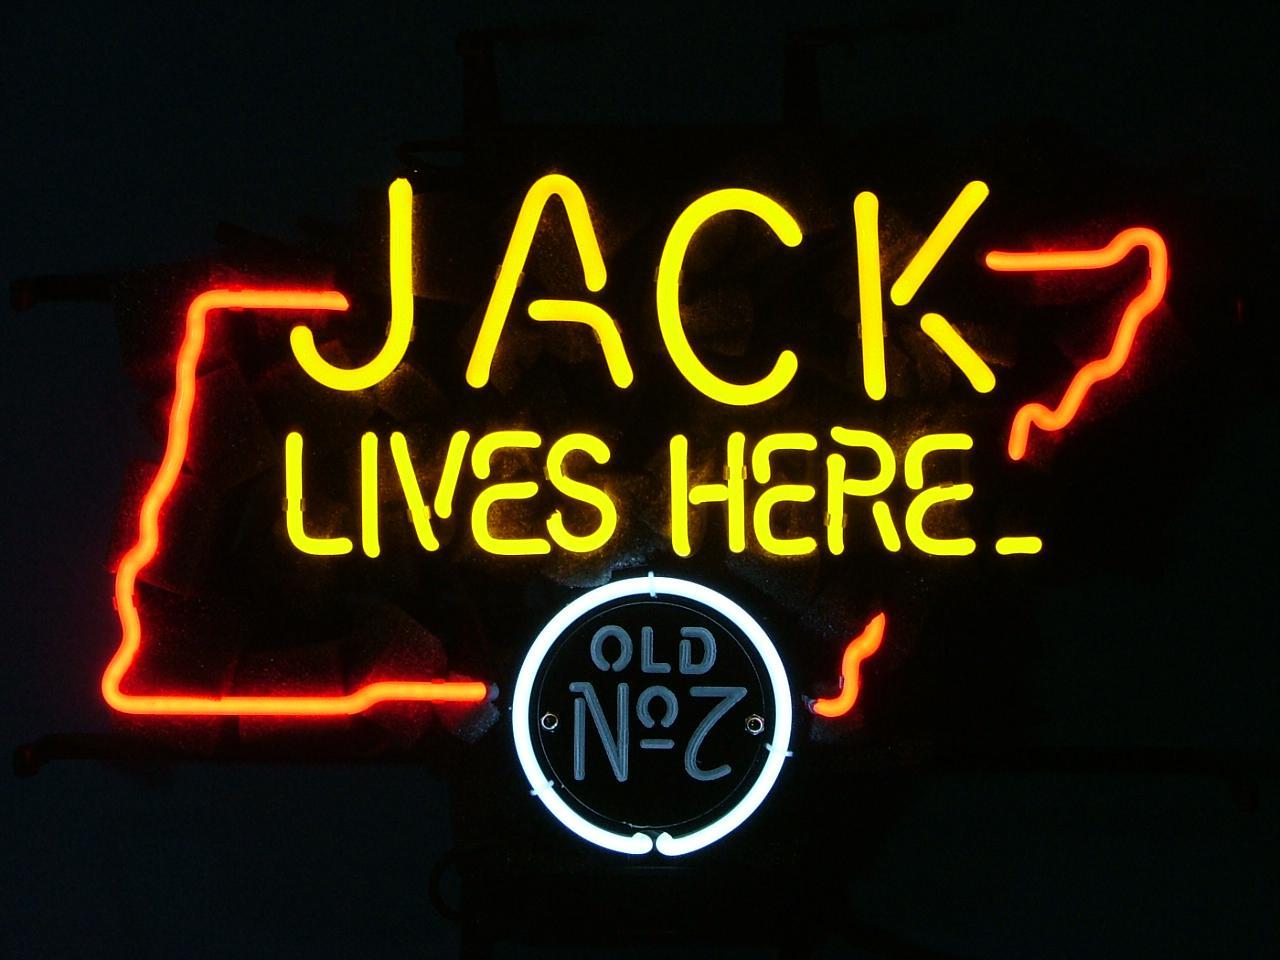 2020 JACK DANIELS JACK LIVES HERE TENNESSEE BEER BAR PUB